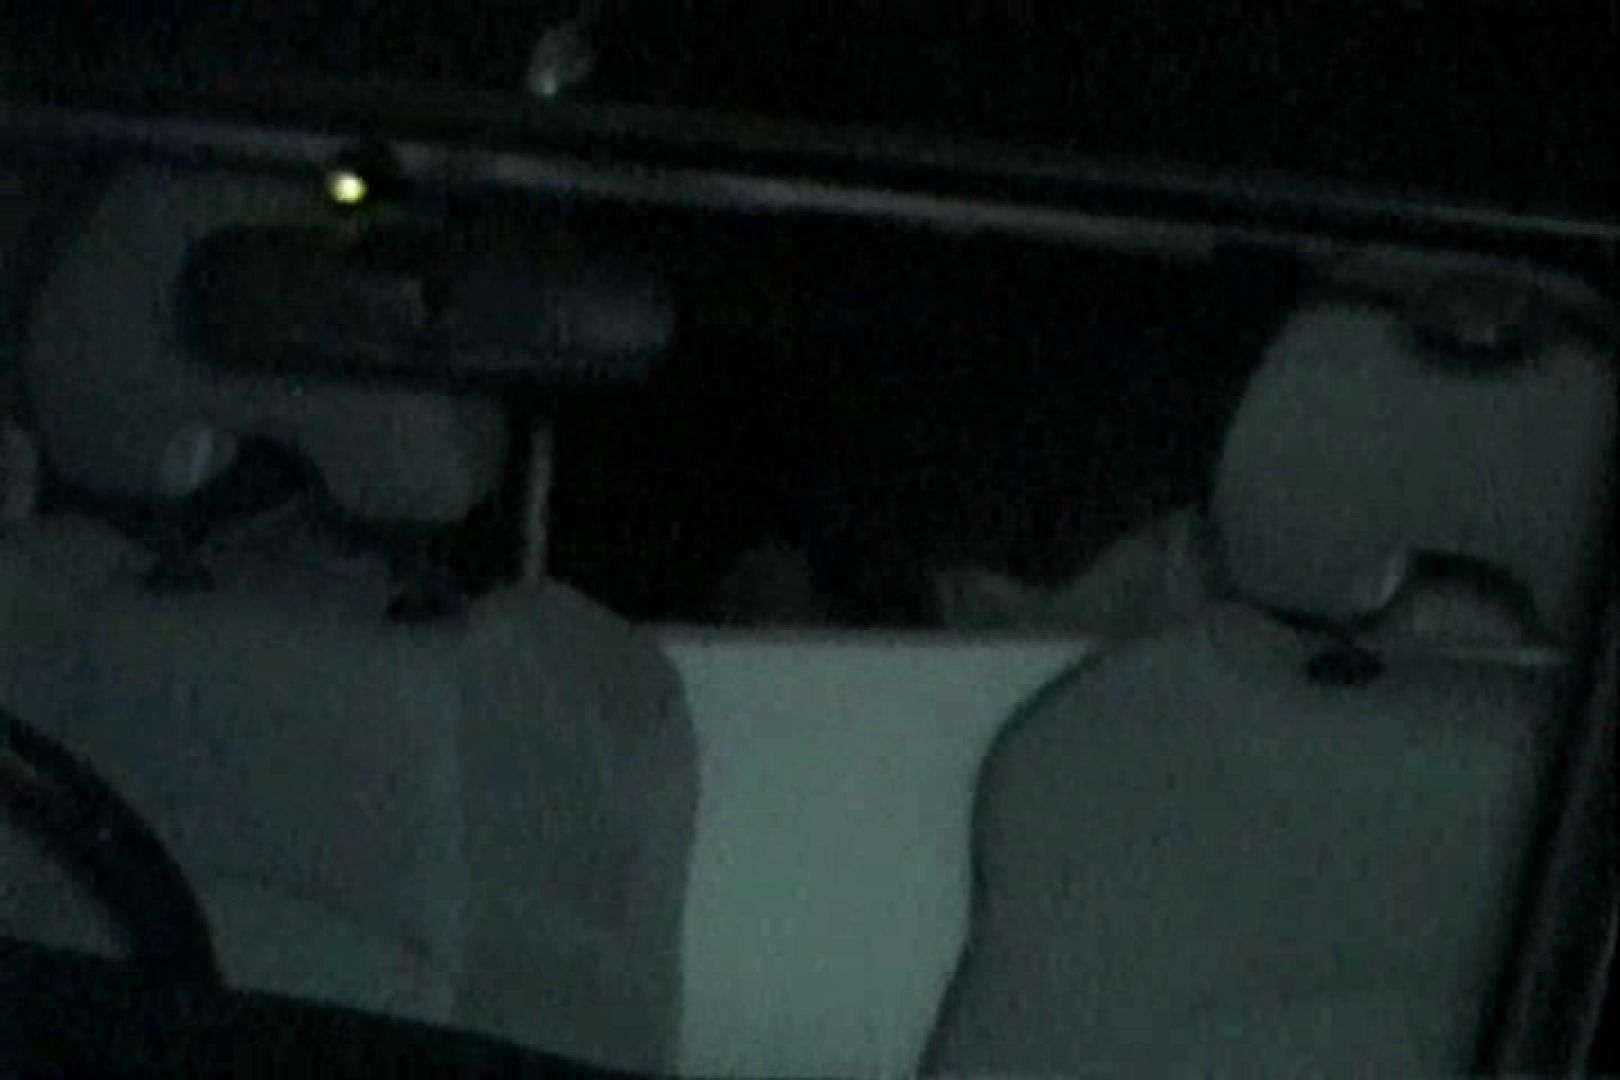 充血監督の深夜の運動会Vol.125 接写 オメコ無修正動画無料 63画像 21